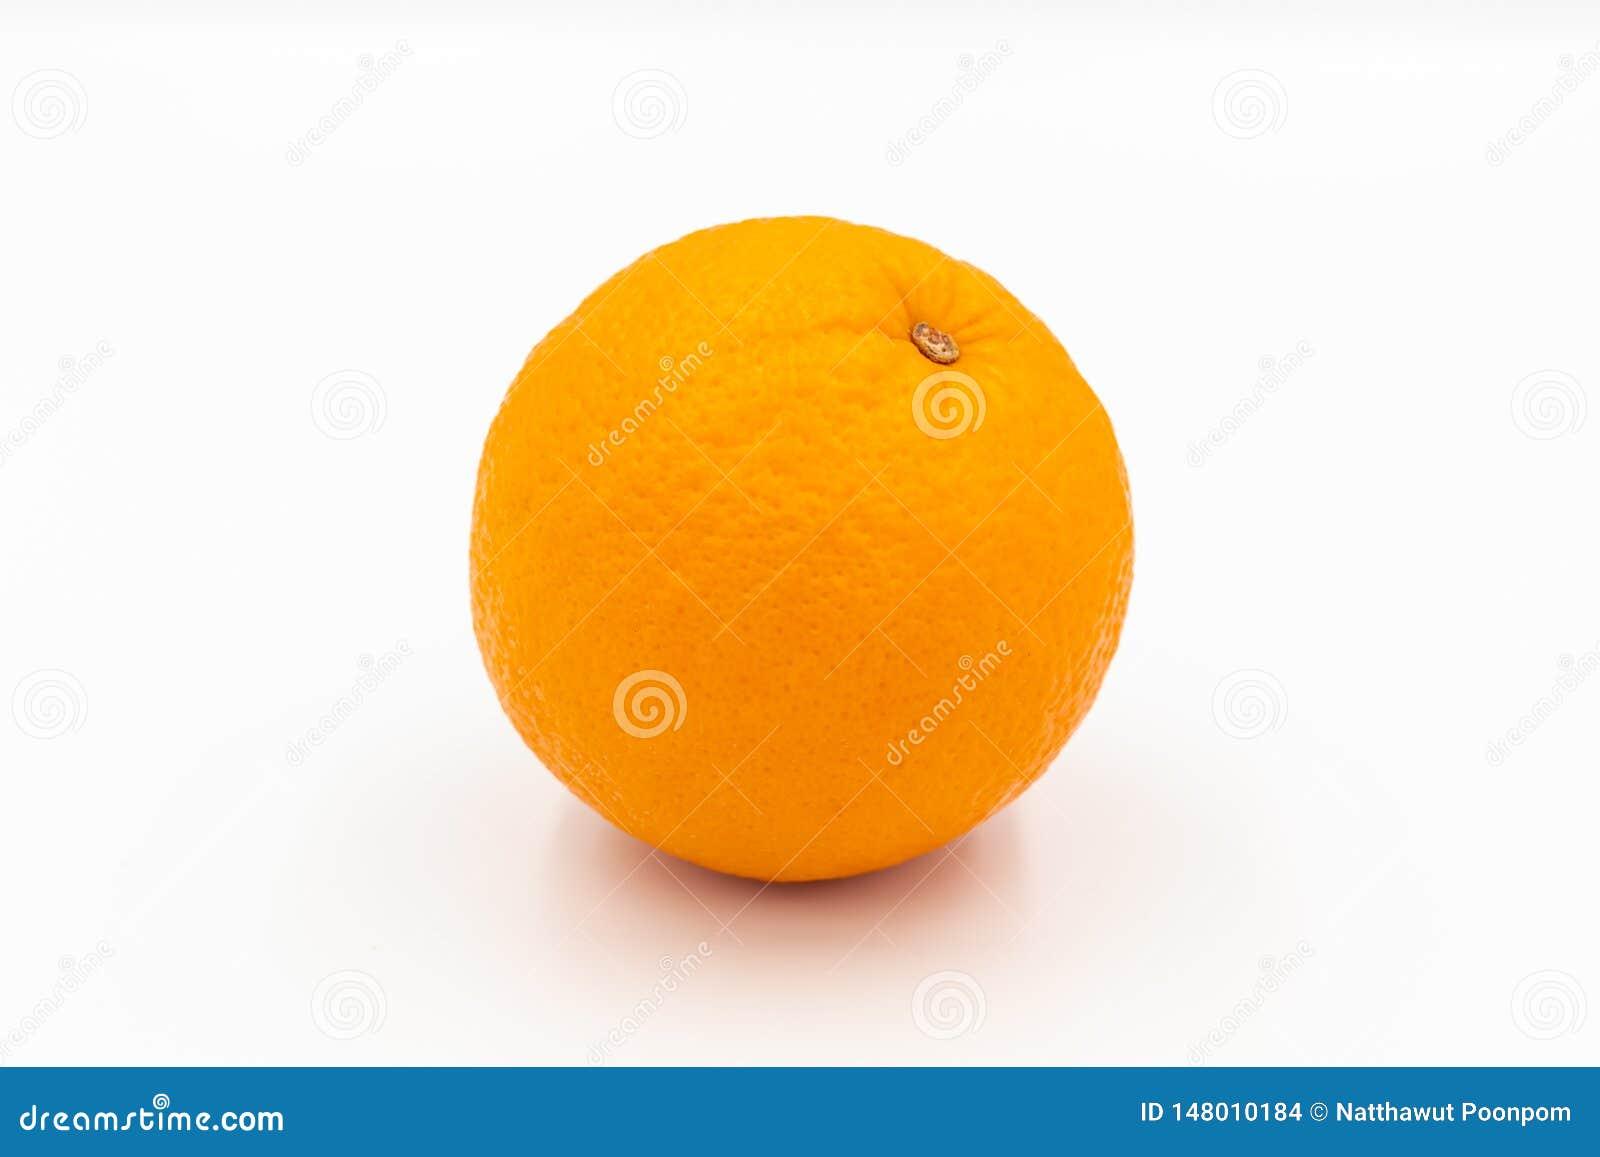 Orange sunkist